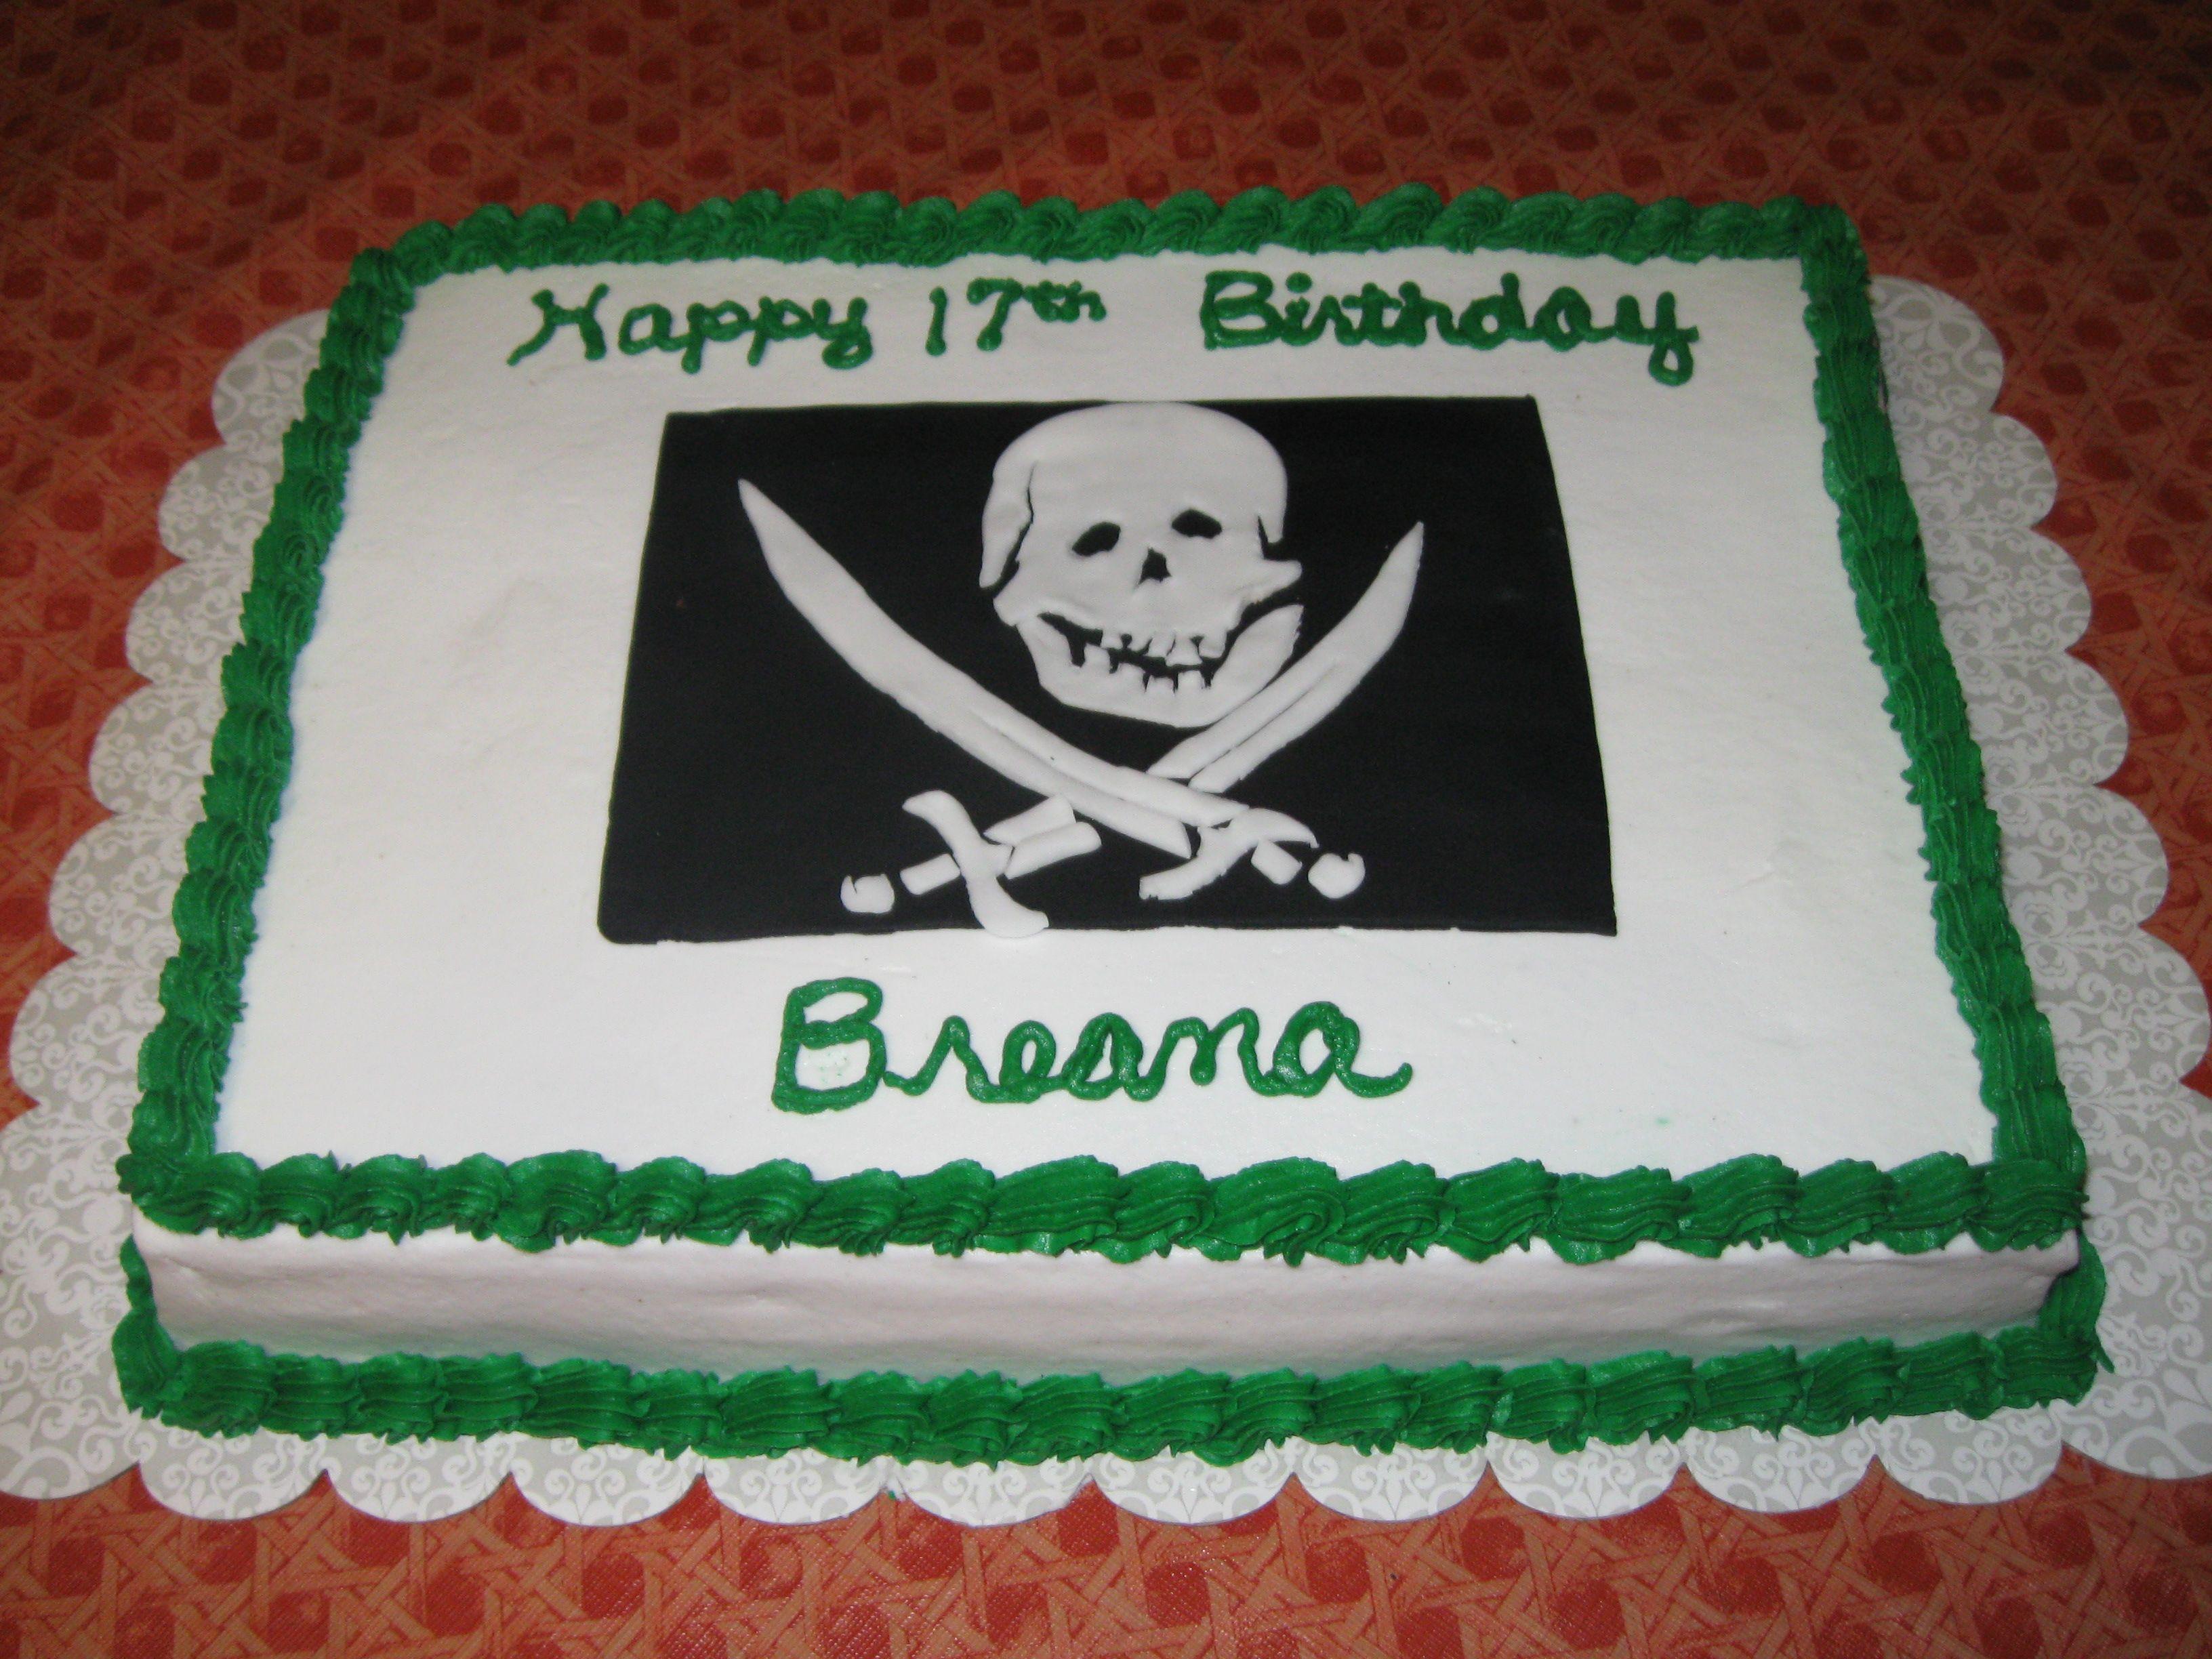 Cake decorating oceanside